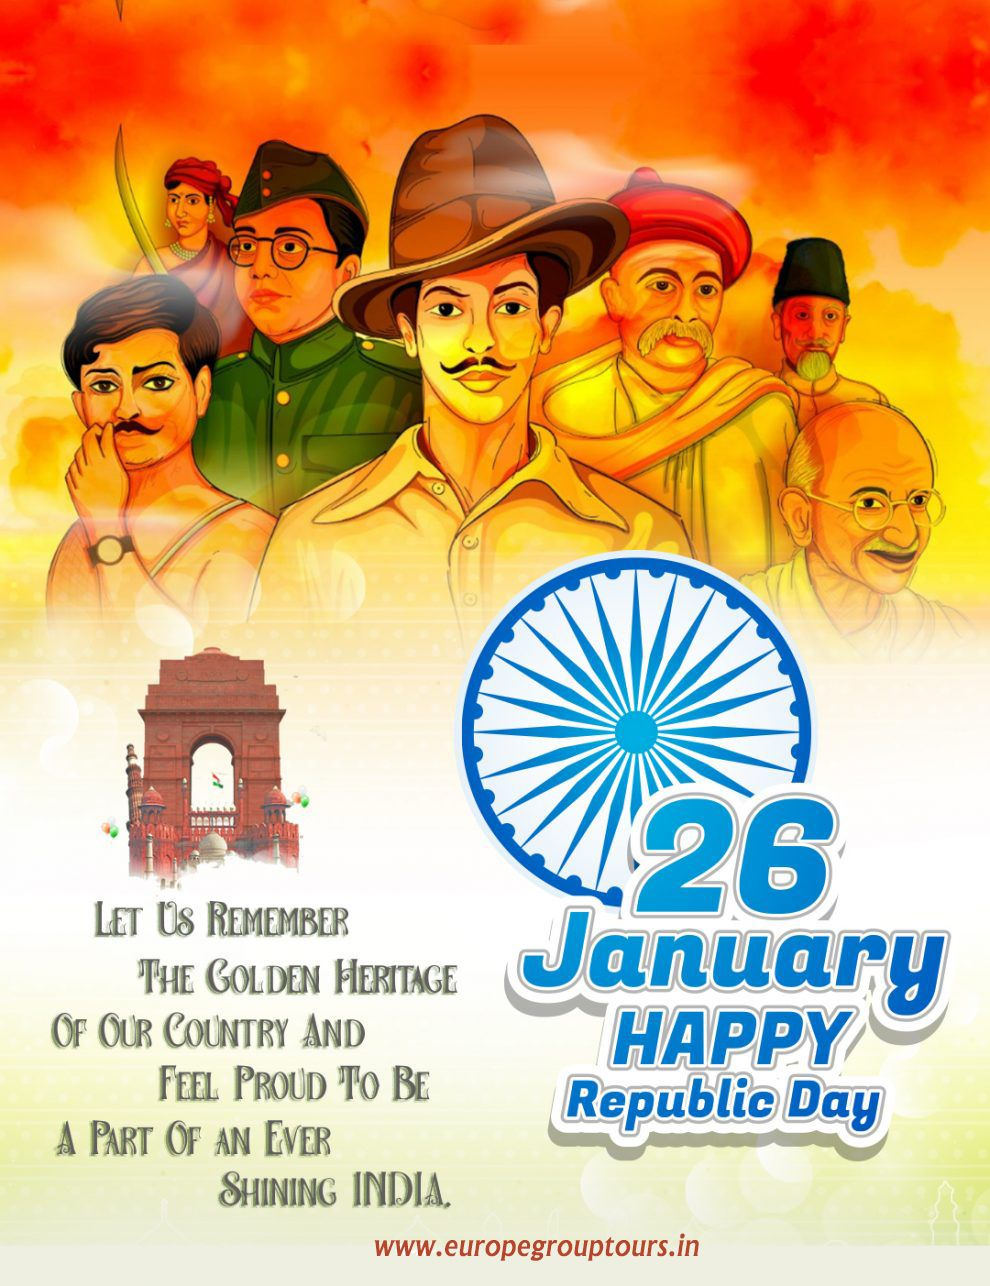 Happy Republic Day In 2021 Republic Day Republic Day India Independence Day Drawing Happy republic day india 2021 wishes